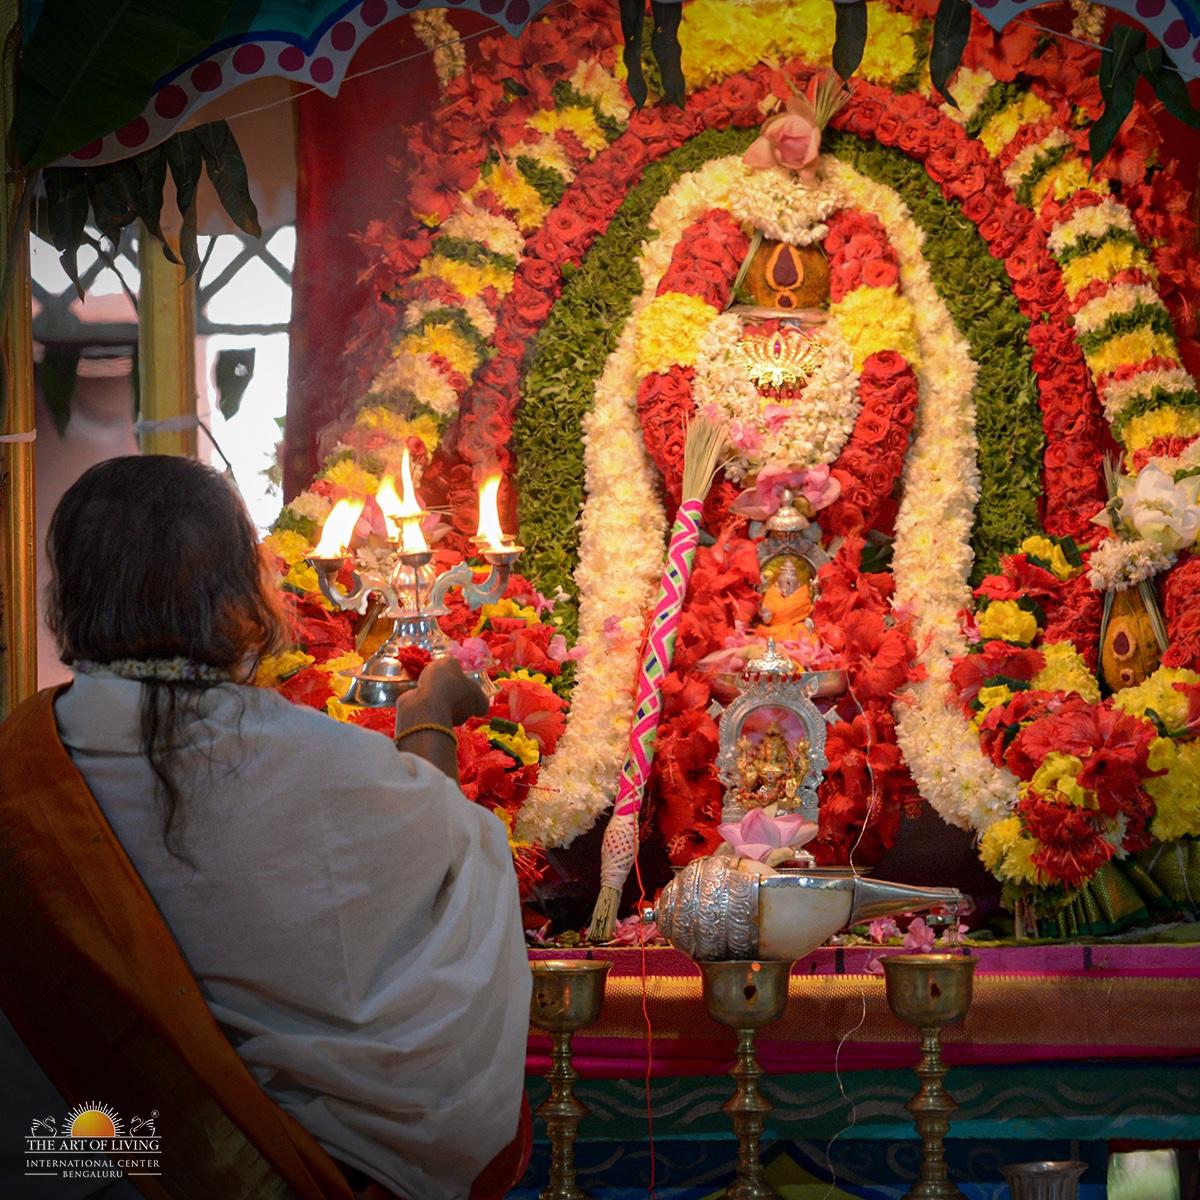 Shat Chandi Homa - the pinnacle of all the Homas of #Navratri2020 celebrations concluded today in the presence of Gurudev @SriSriRaviShankar. https://t.co/k4qx0YAc4V